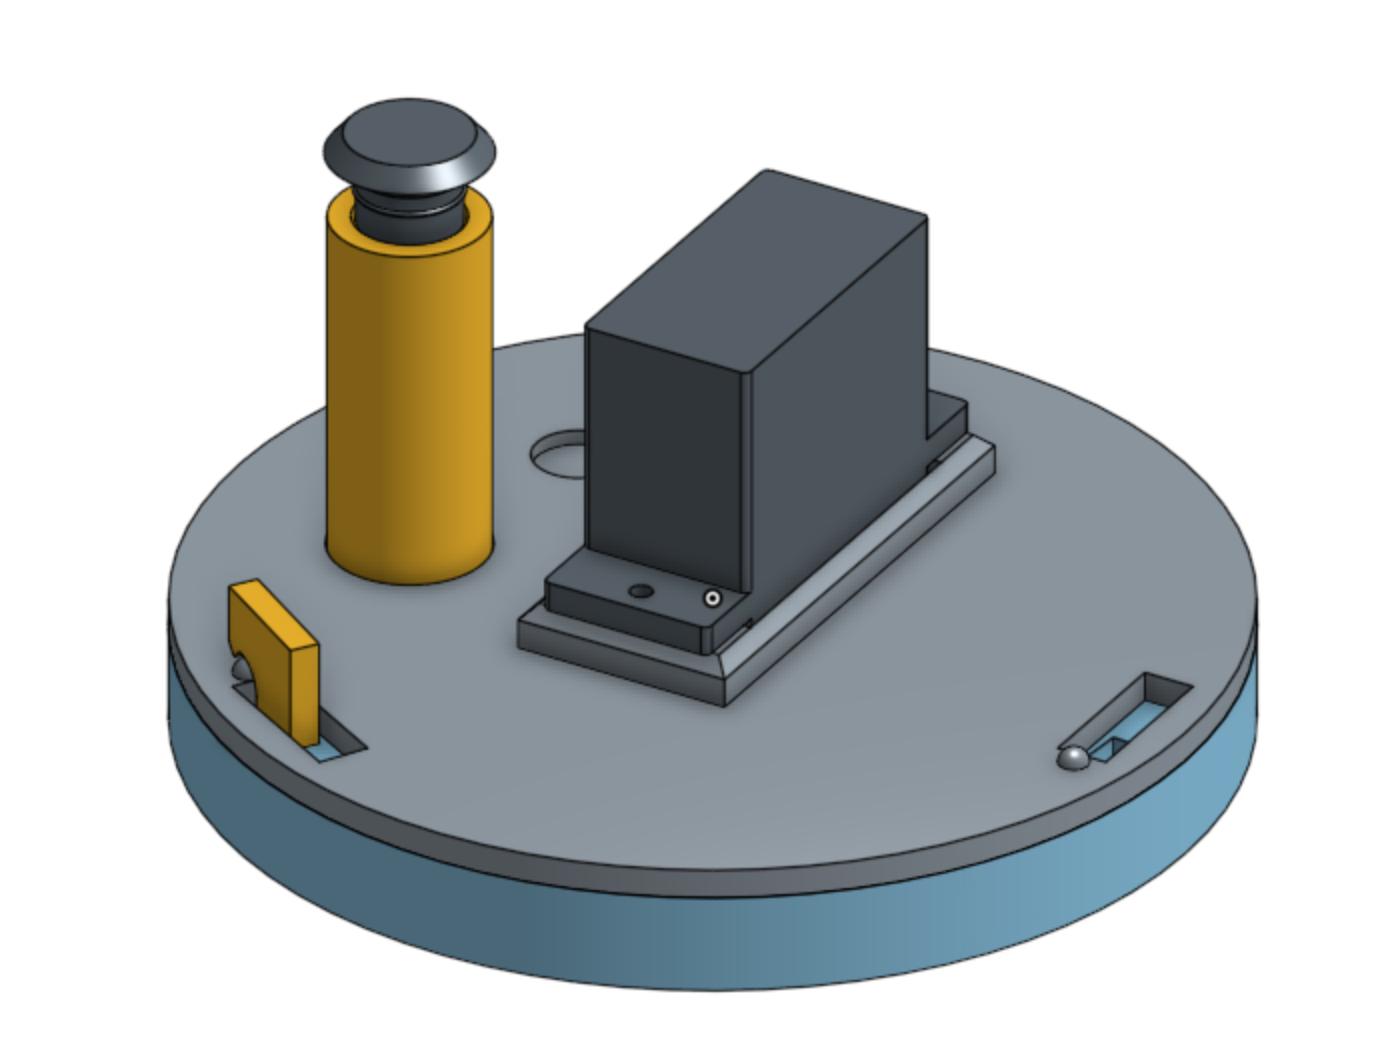 CAD model rendering